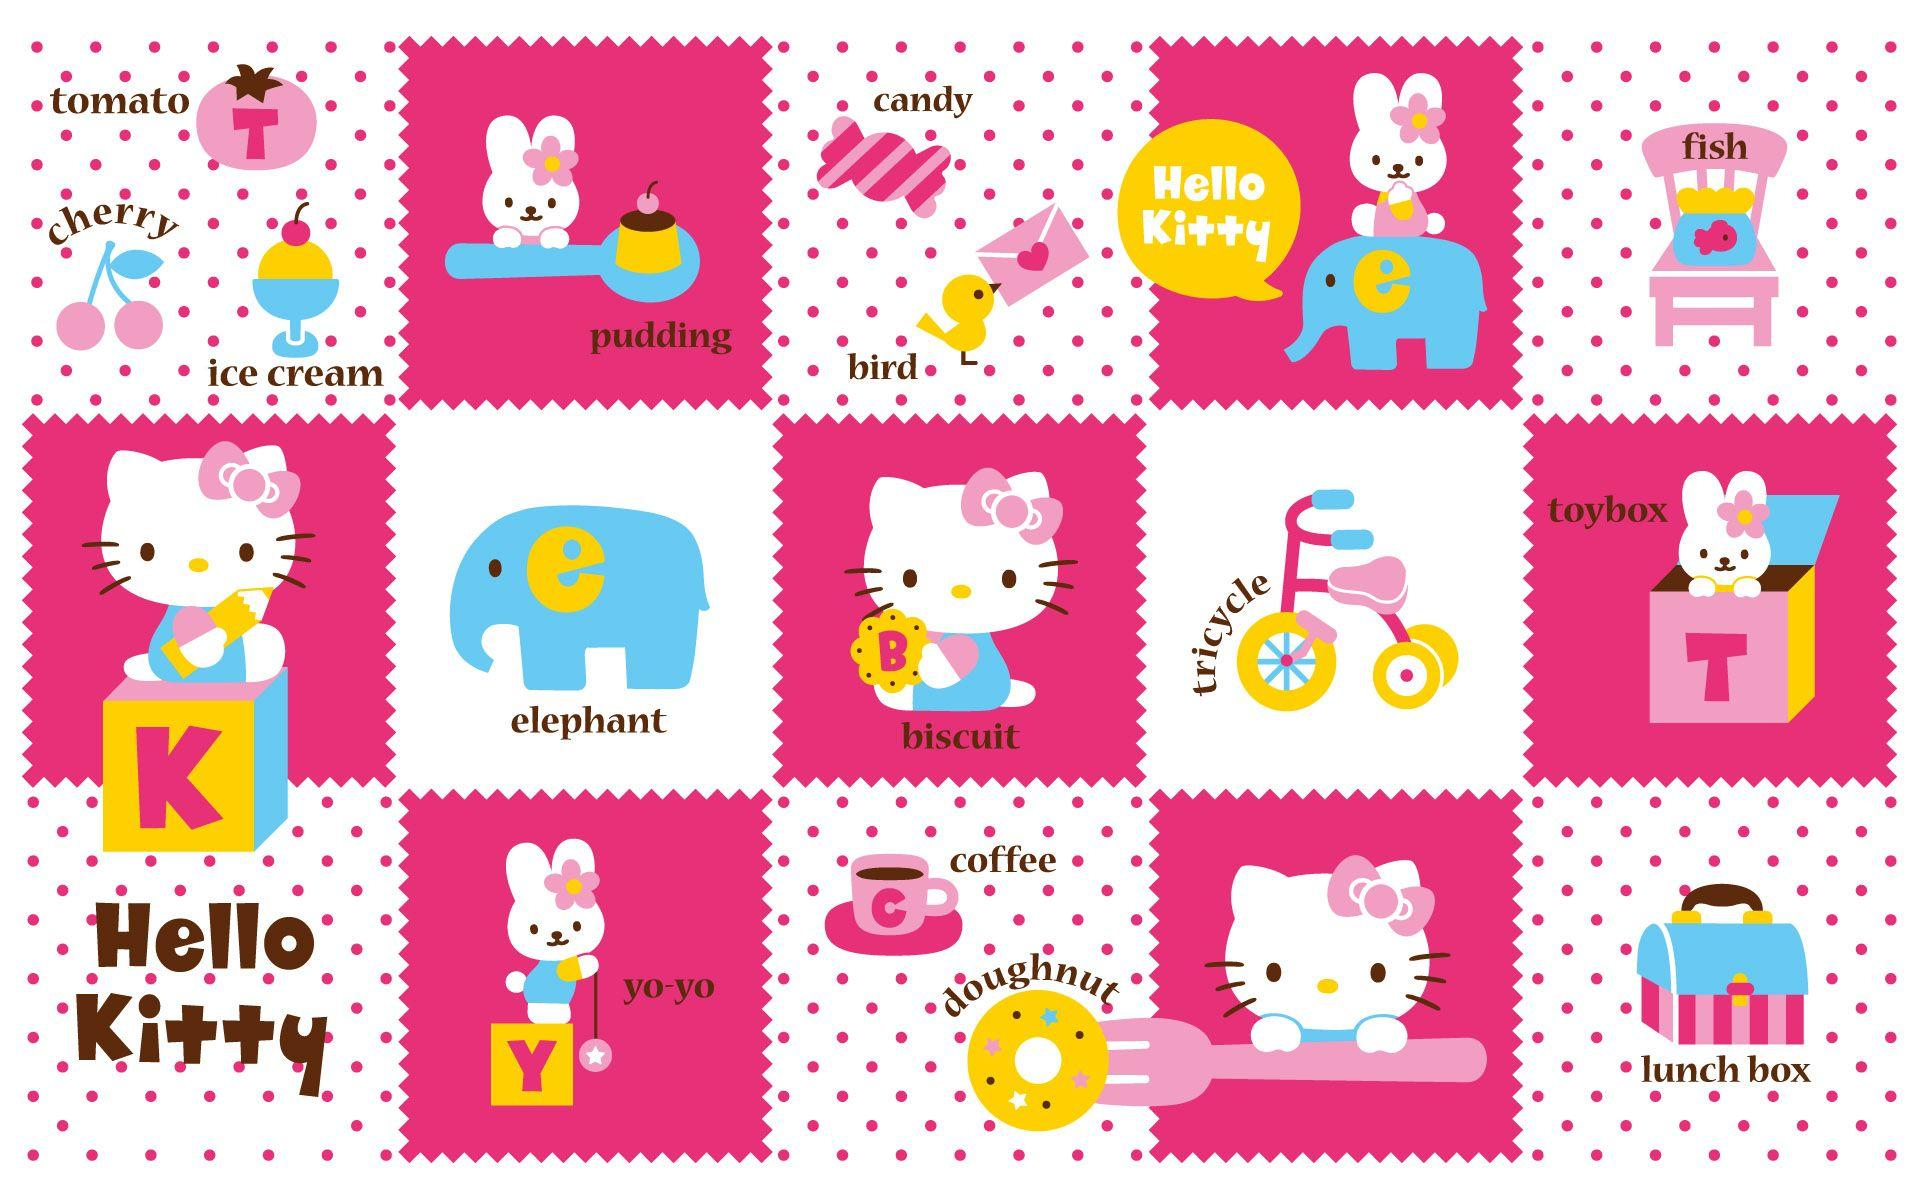 Good Wallpaper Hello Kitty Swag - 1SnZjX  Photograph_69882.jpg